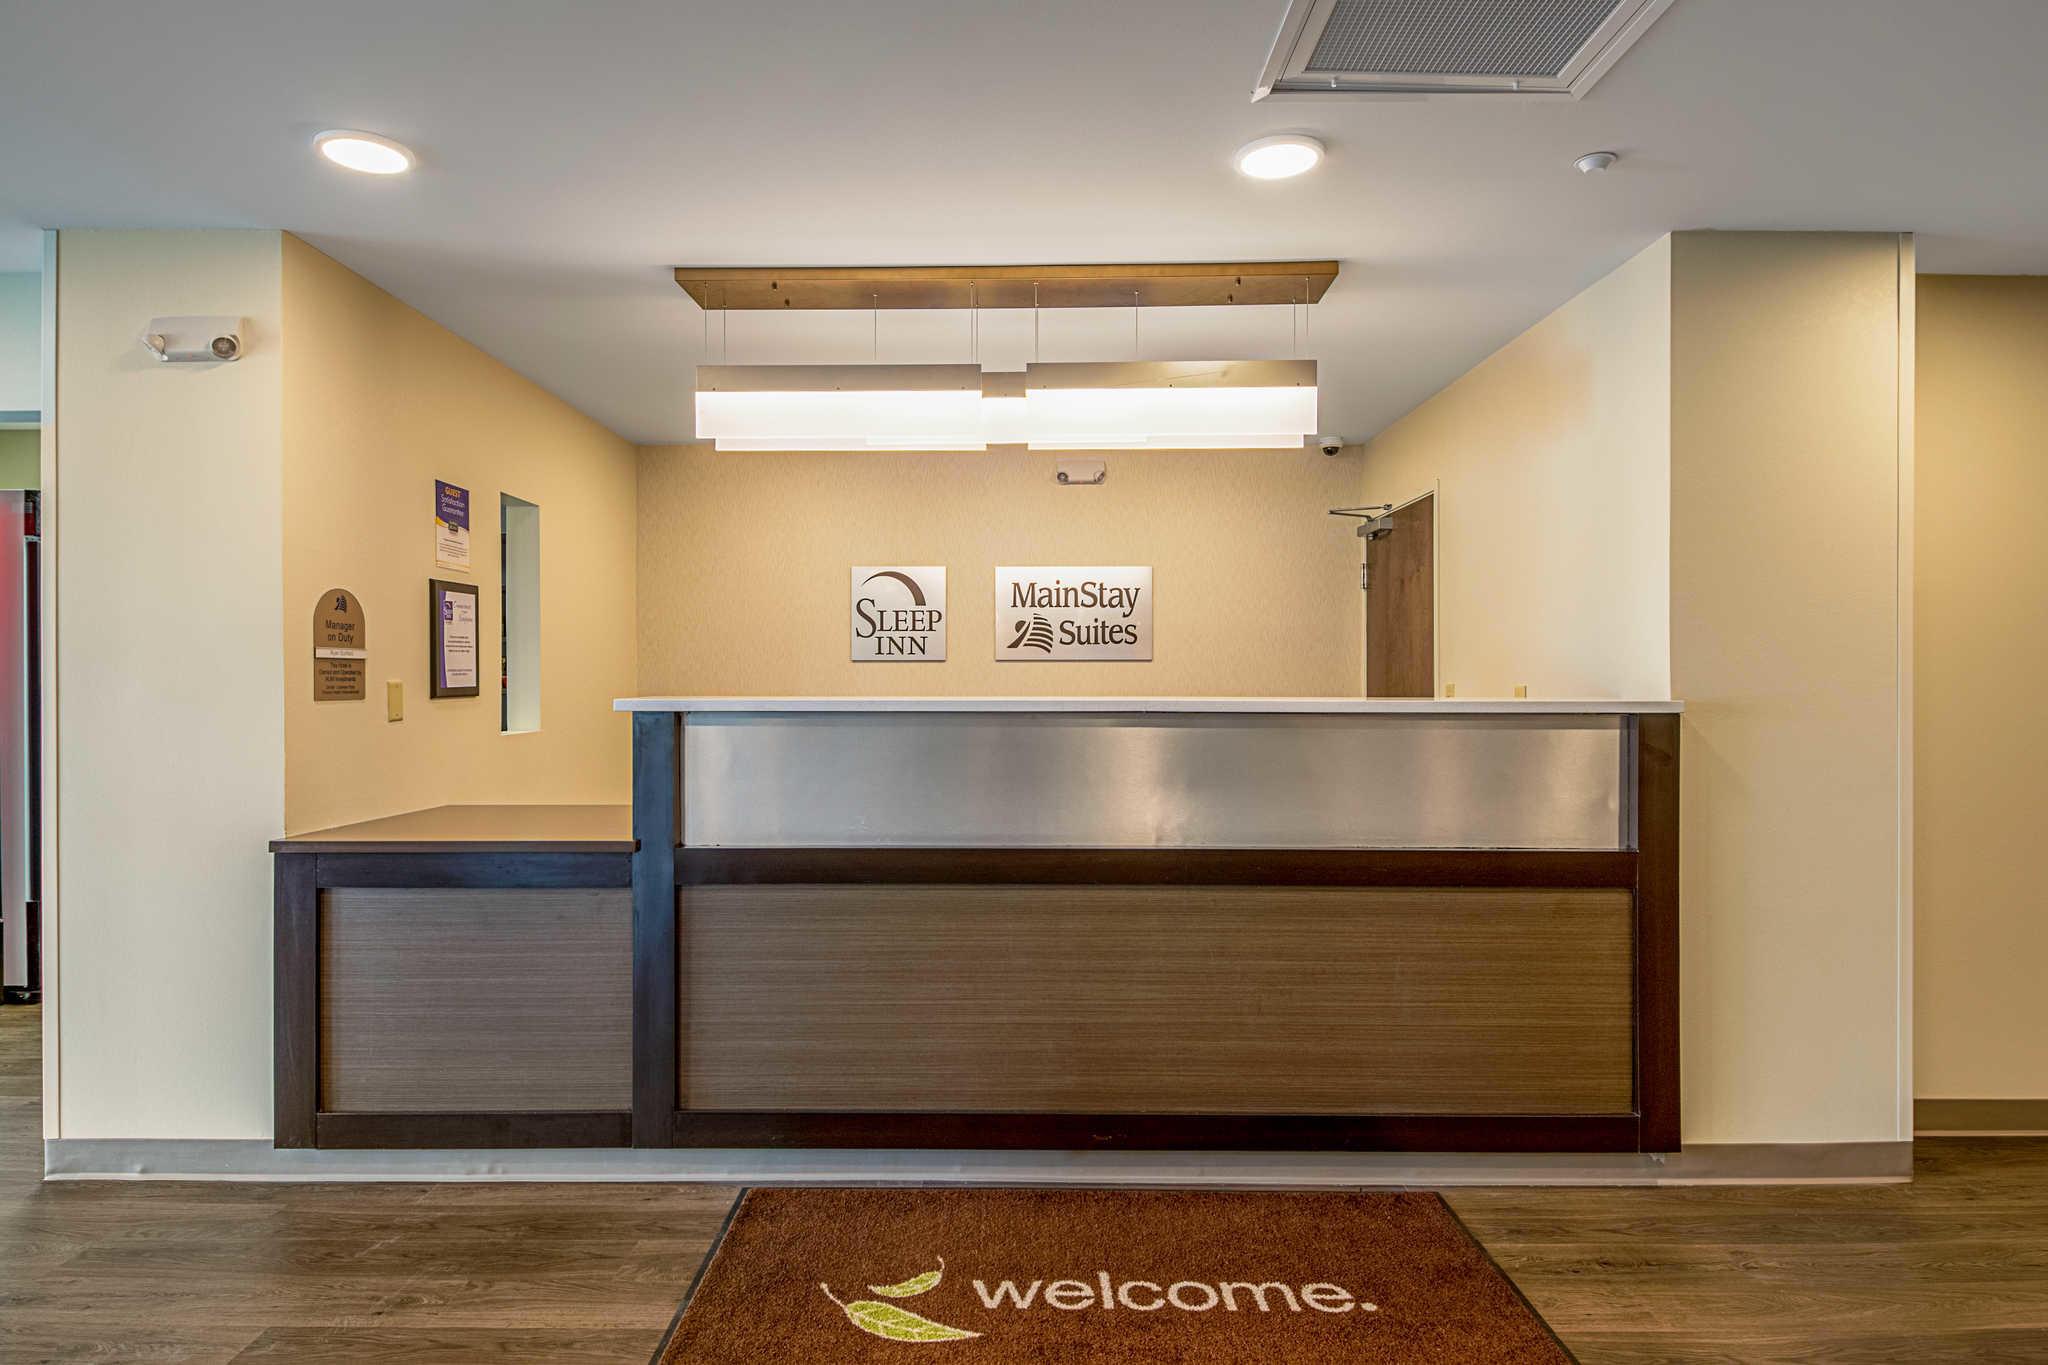 MainStay Suites Geismar - Gonzales image 4